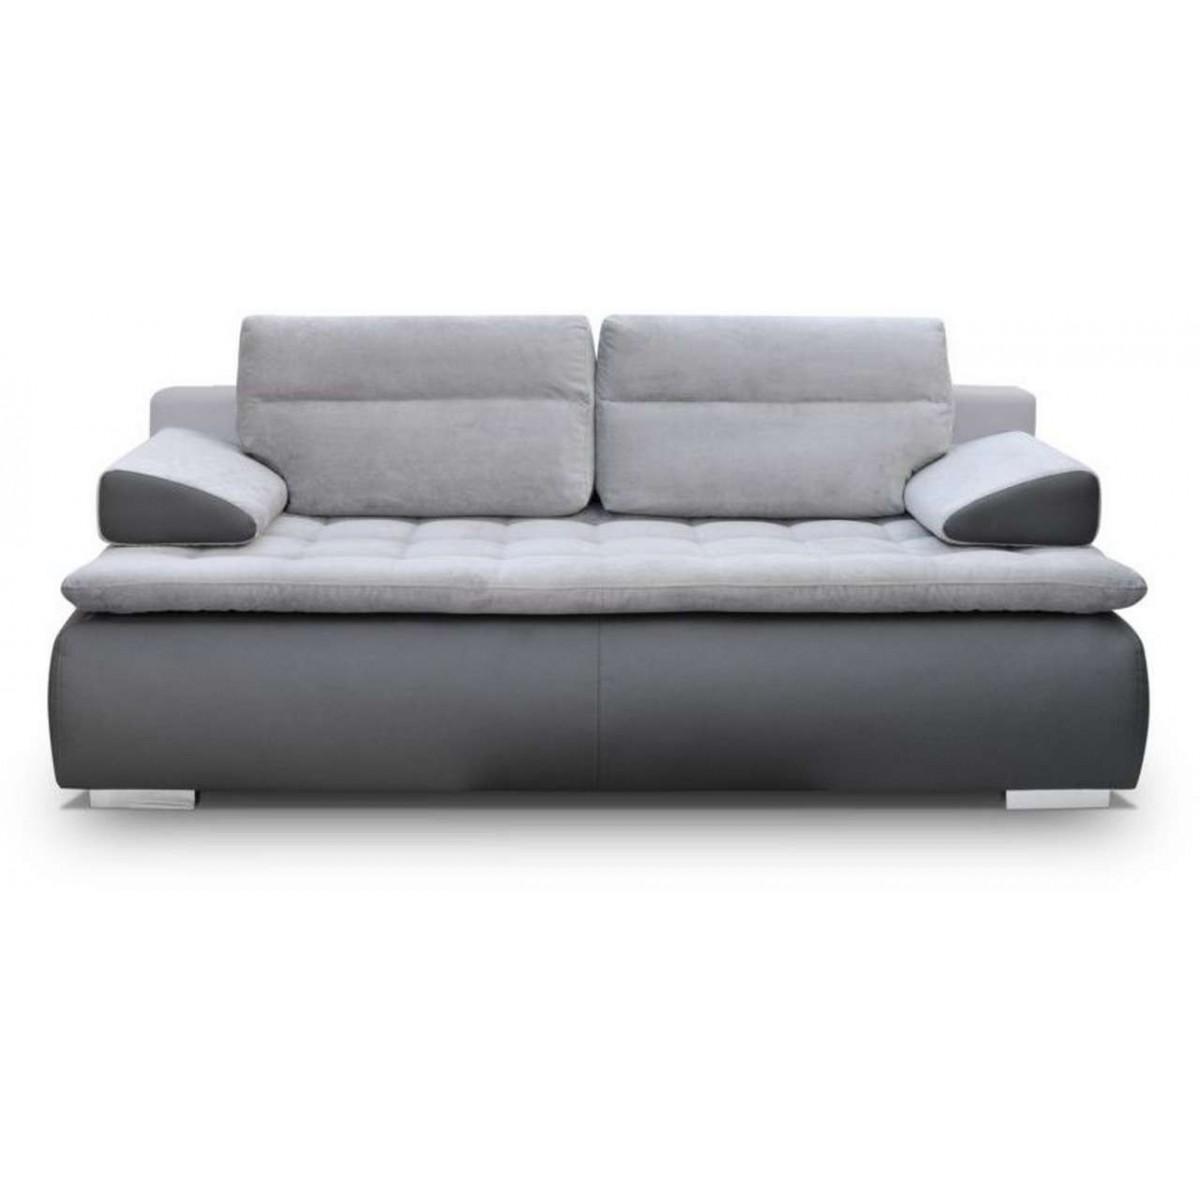 Soho sofa 3DL